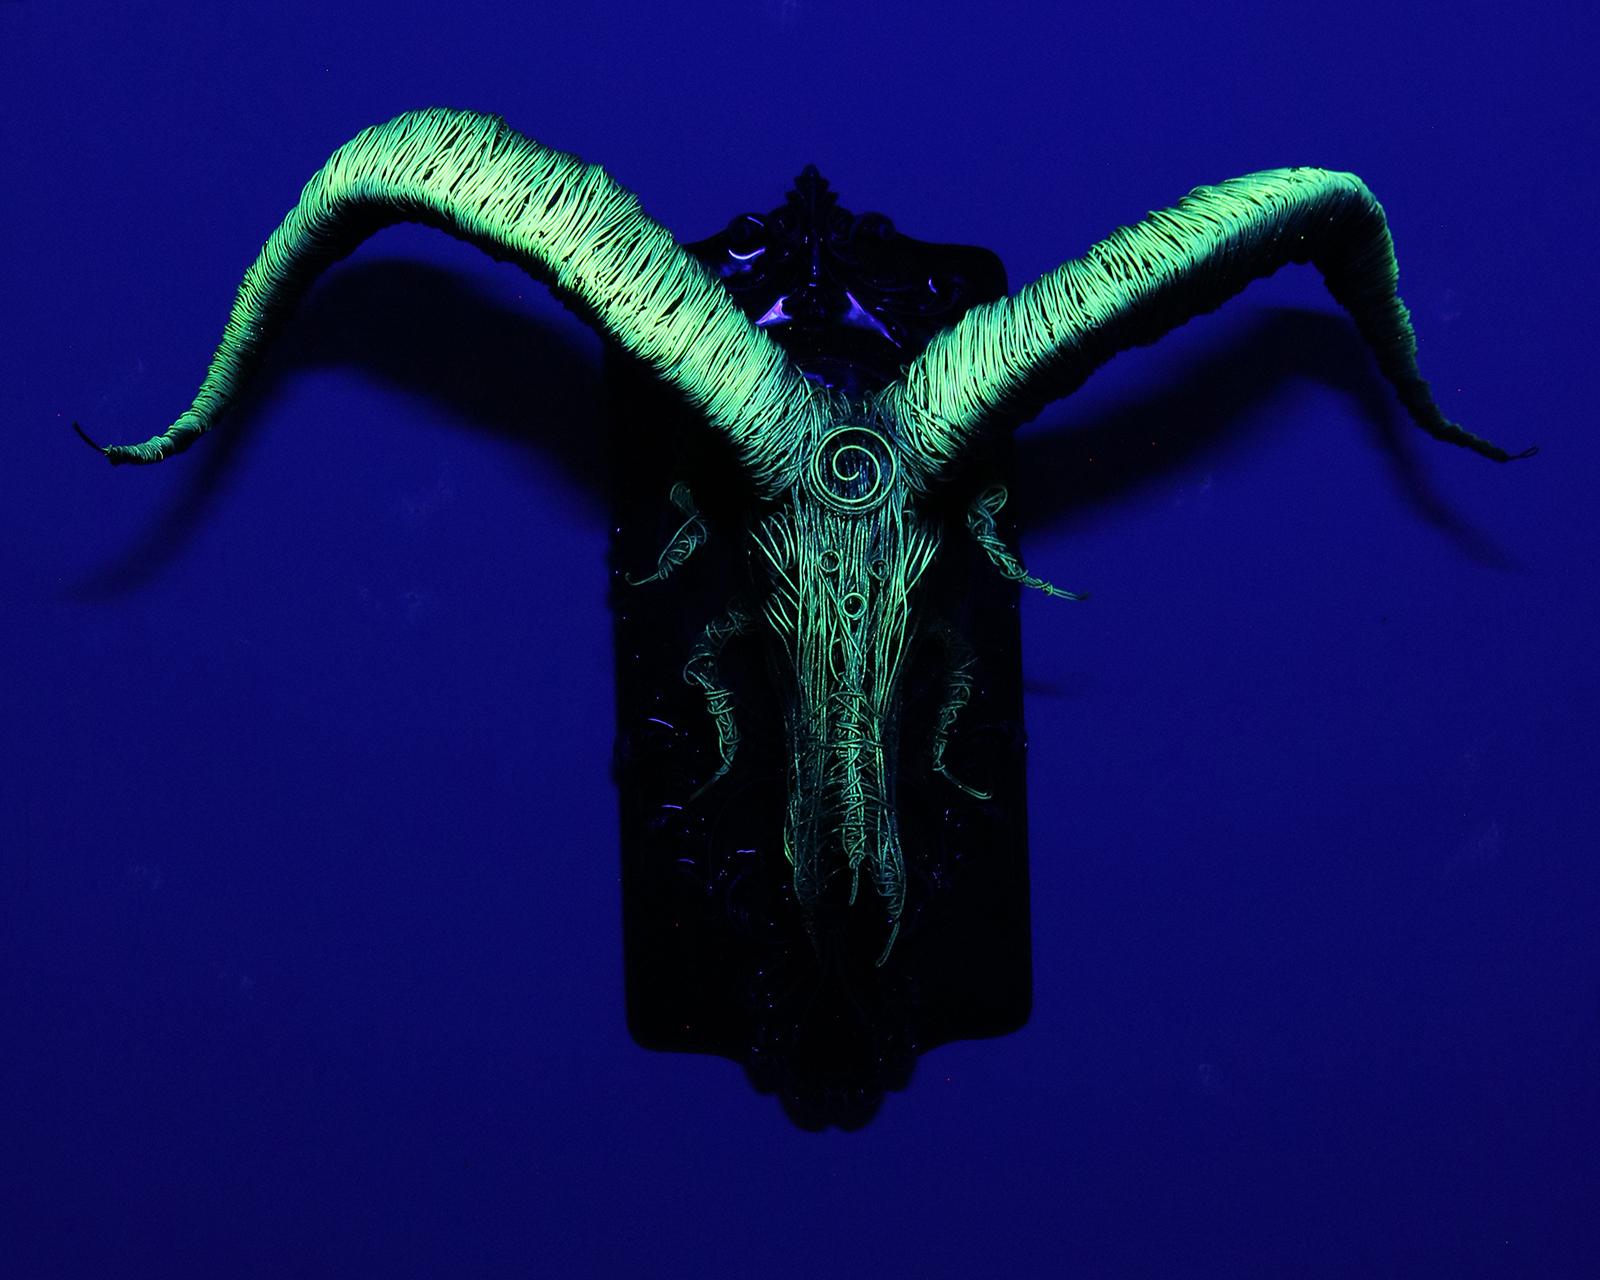 ARIES ASTRIS (Neon)